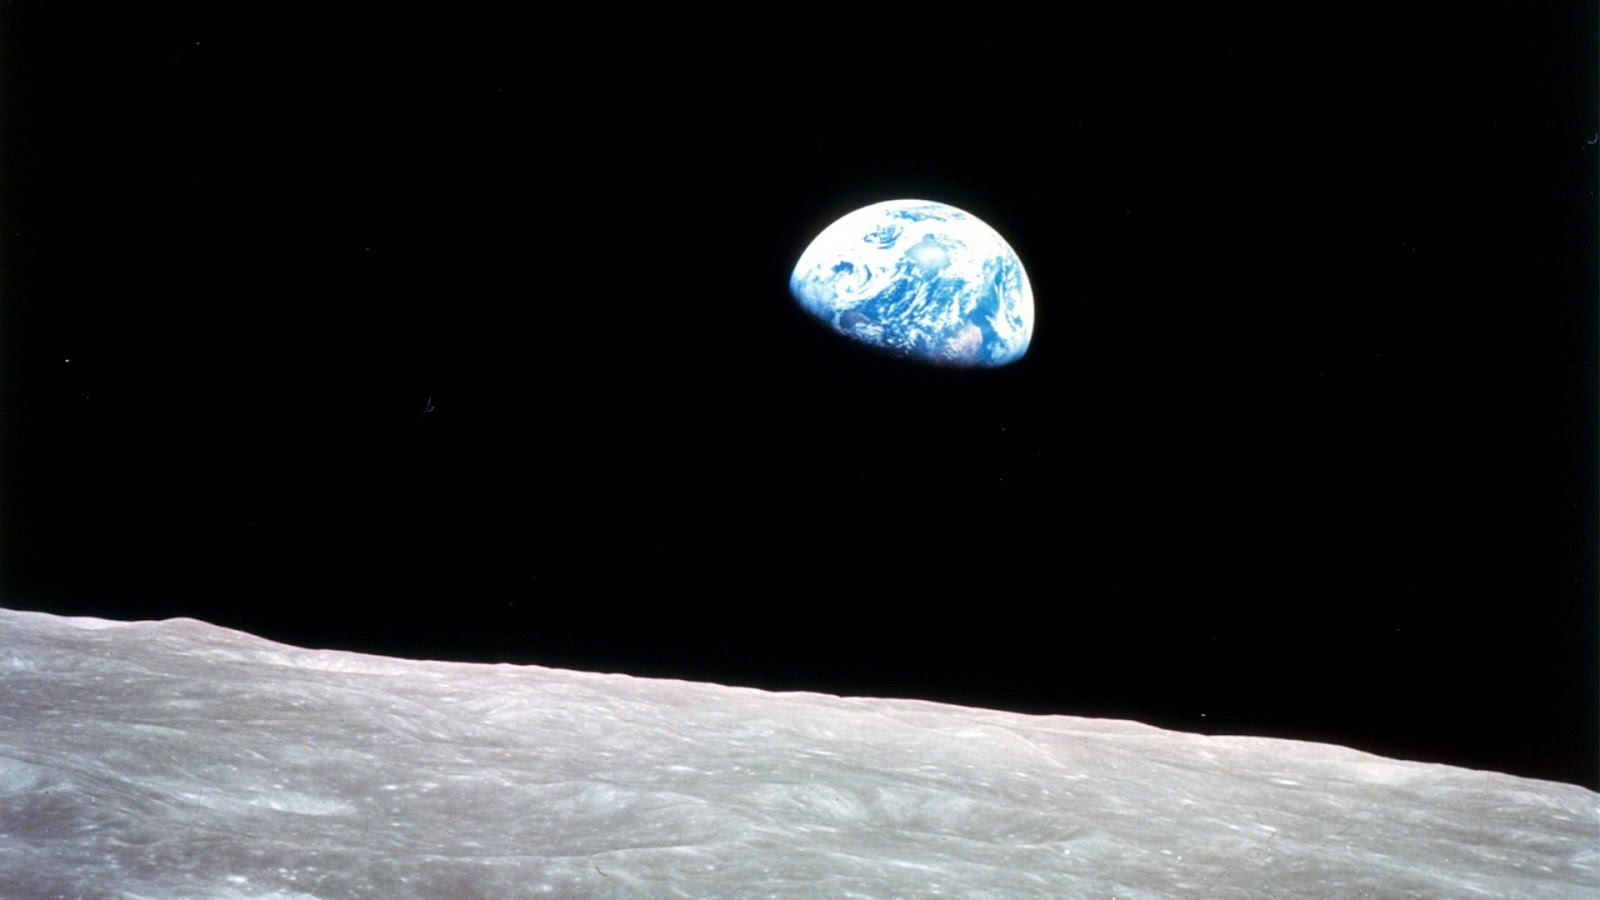 earth wallpaper hd 1080p - photo #8